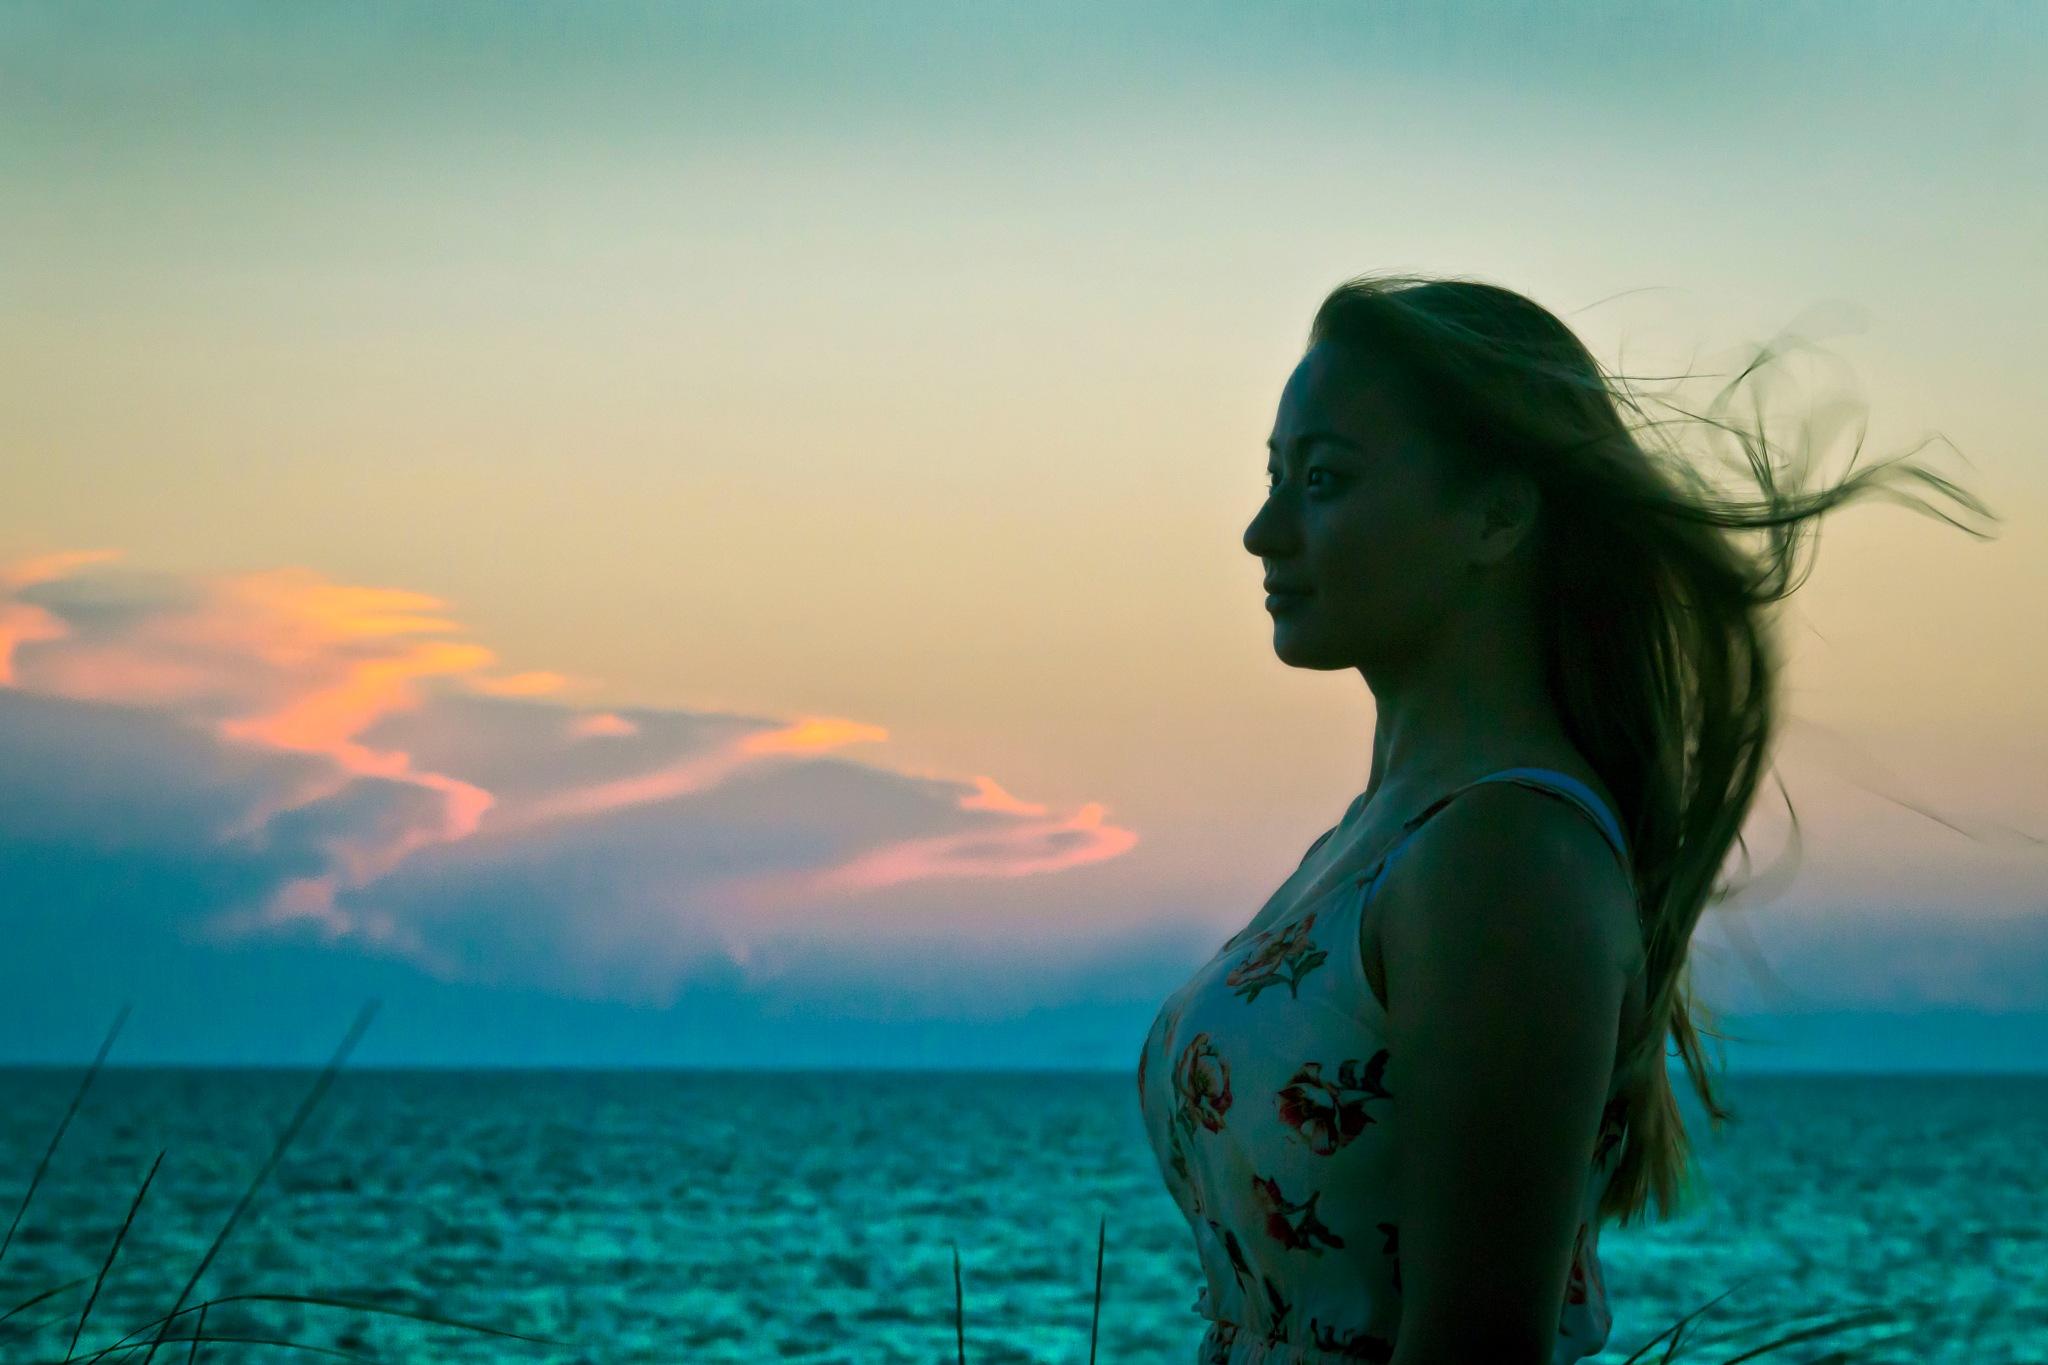 Jade, by Lake Michigan by dave.skorupski